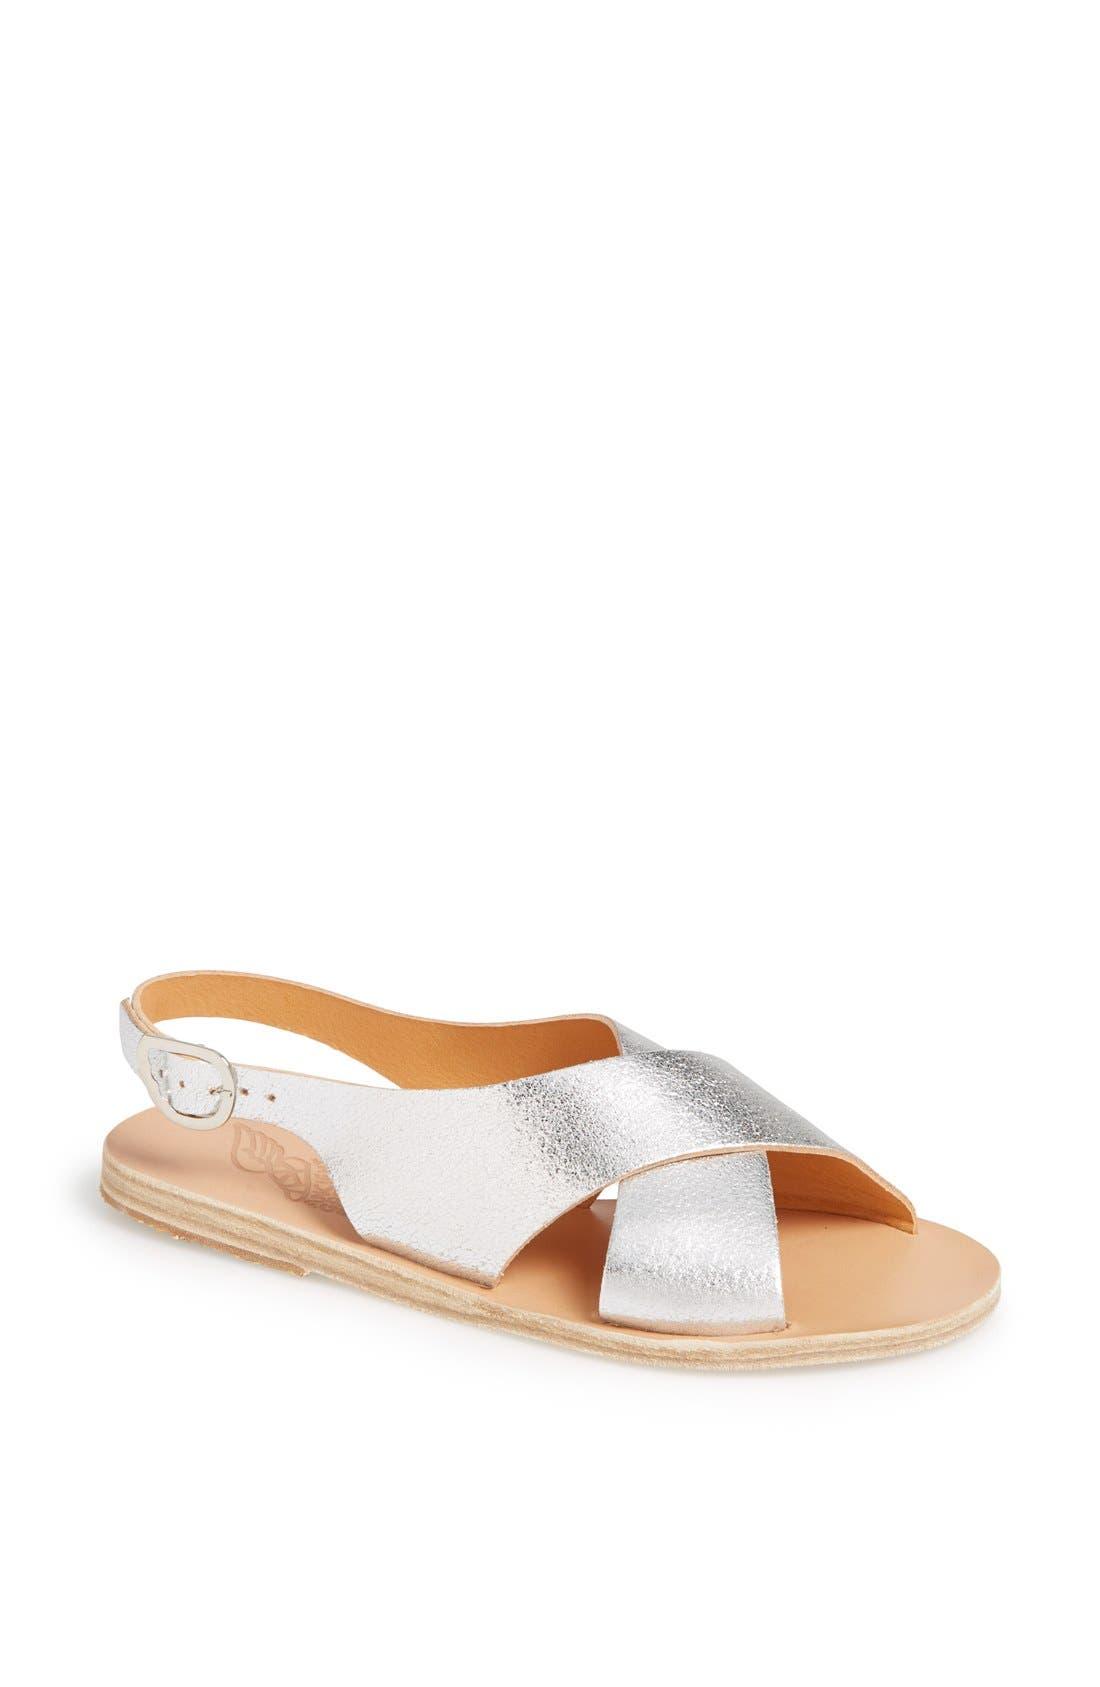 Main Image - Ancient Greek Sandals 'Maria' Leather Slingback Sandal